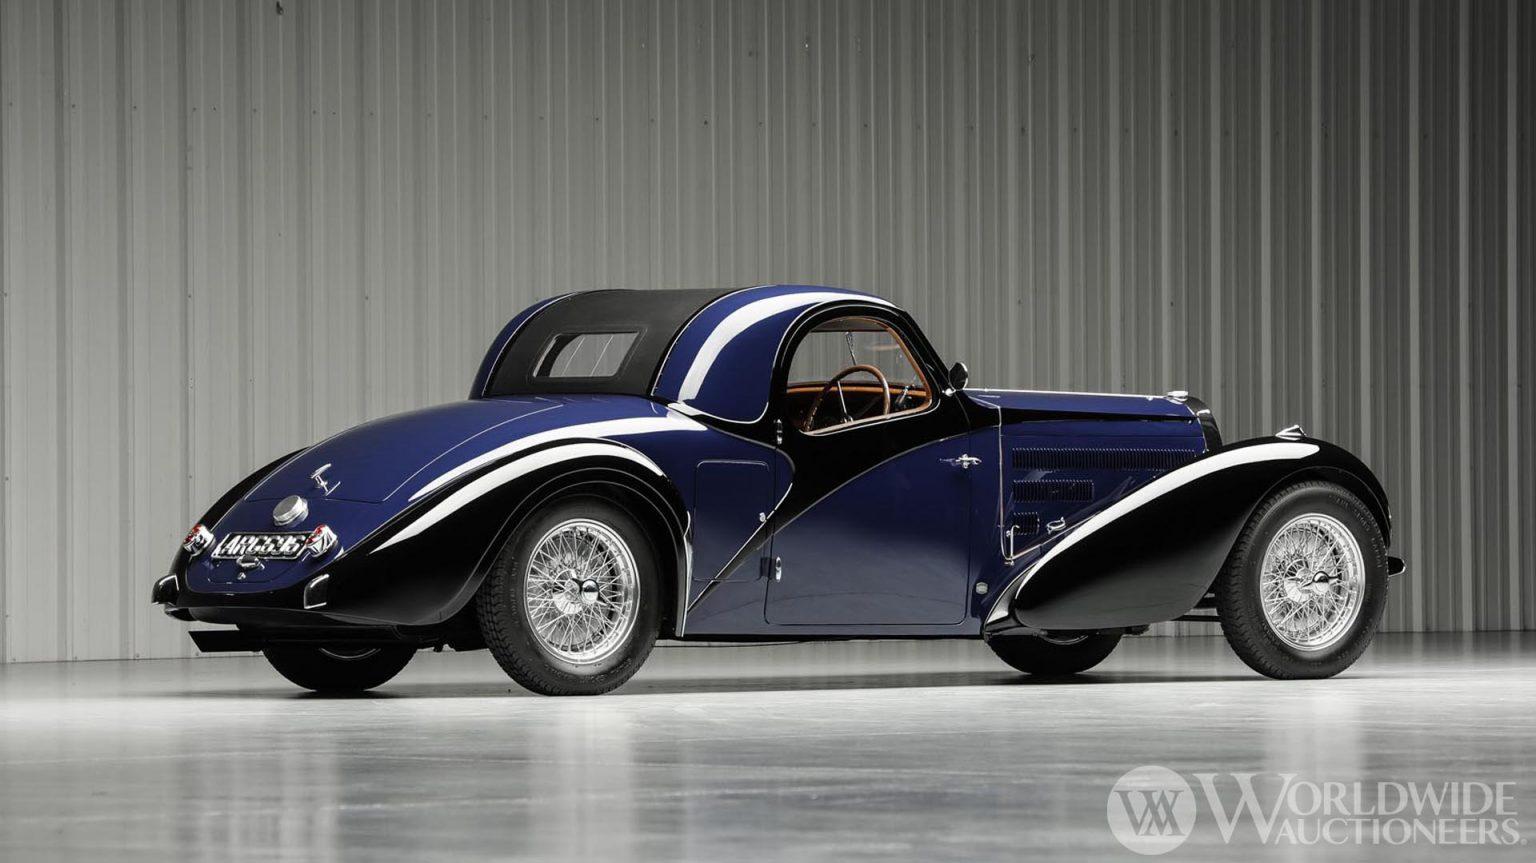 بوجاتي تايب 57 سي أتالانت كوبيه موديل 1938